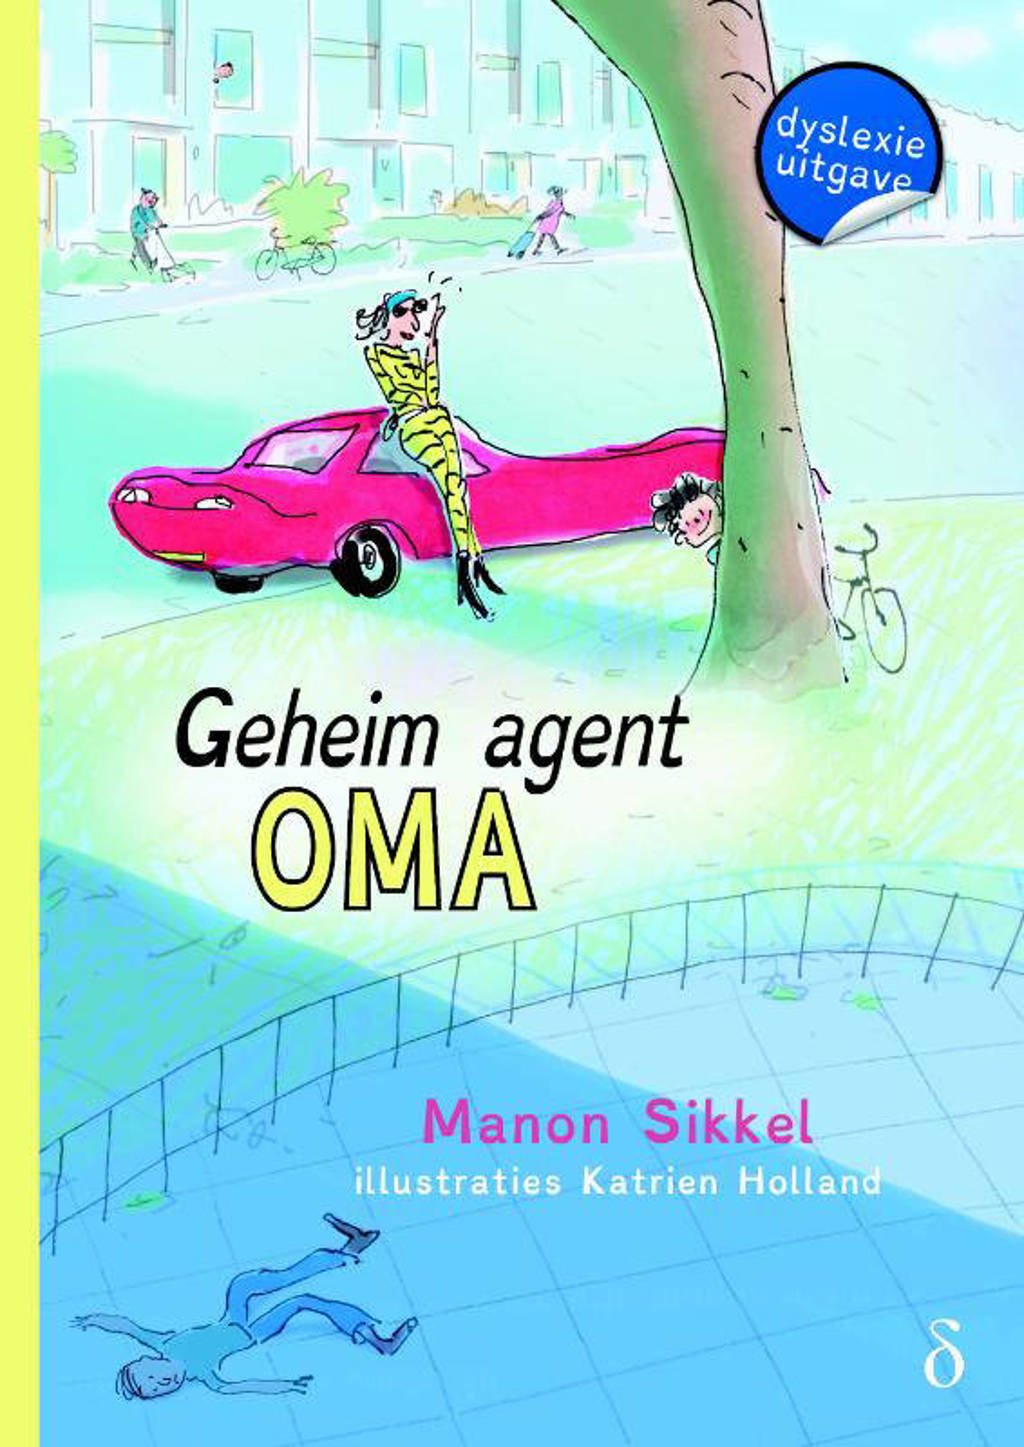 Geheim agent oma - Manon Sikkel